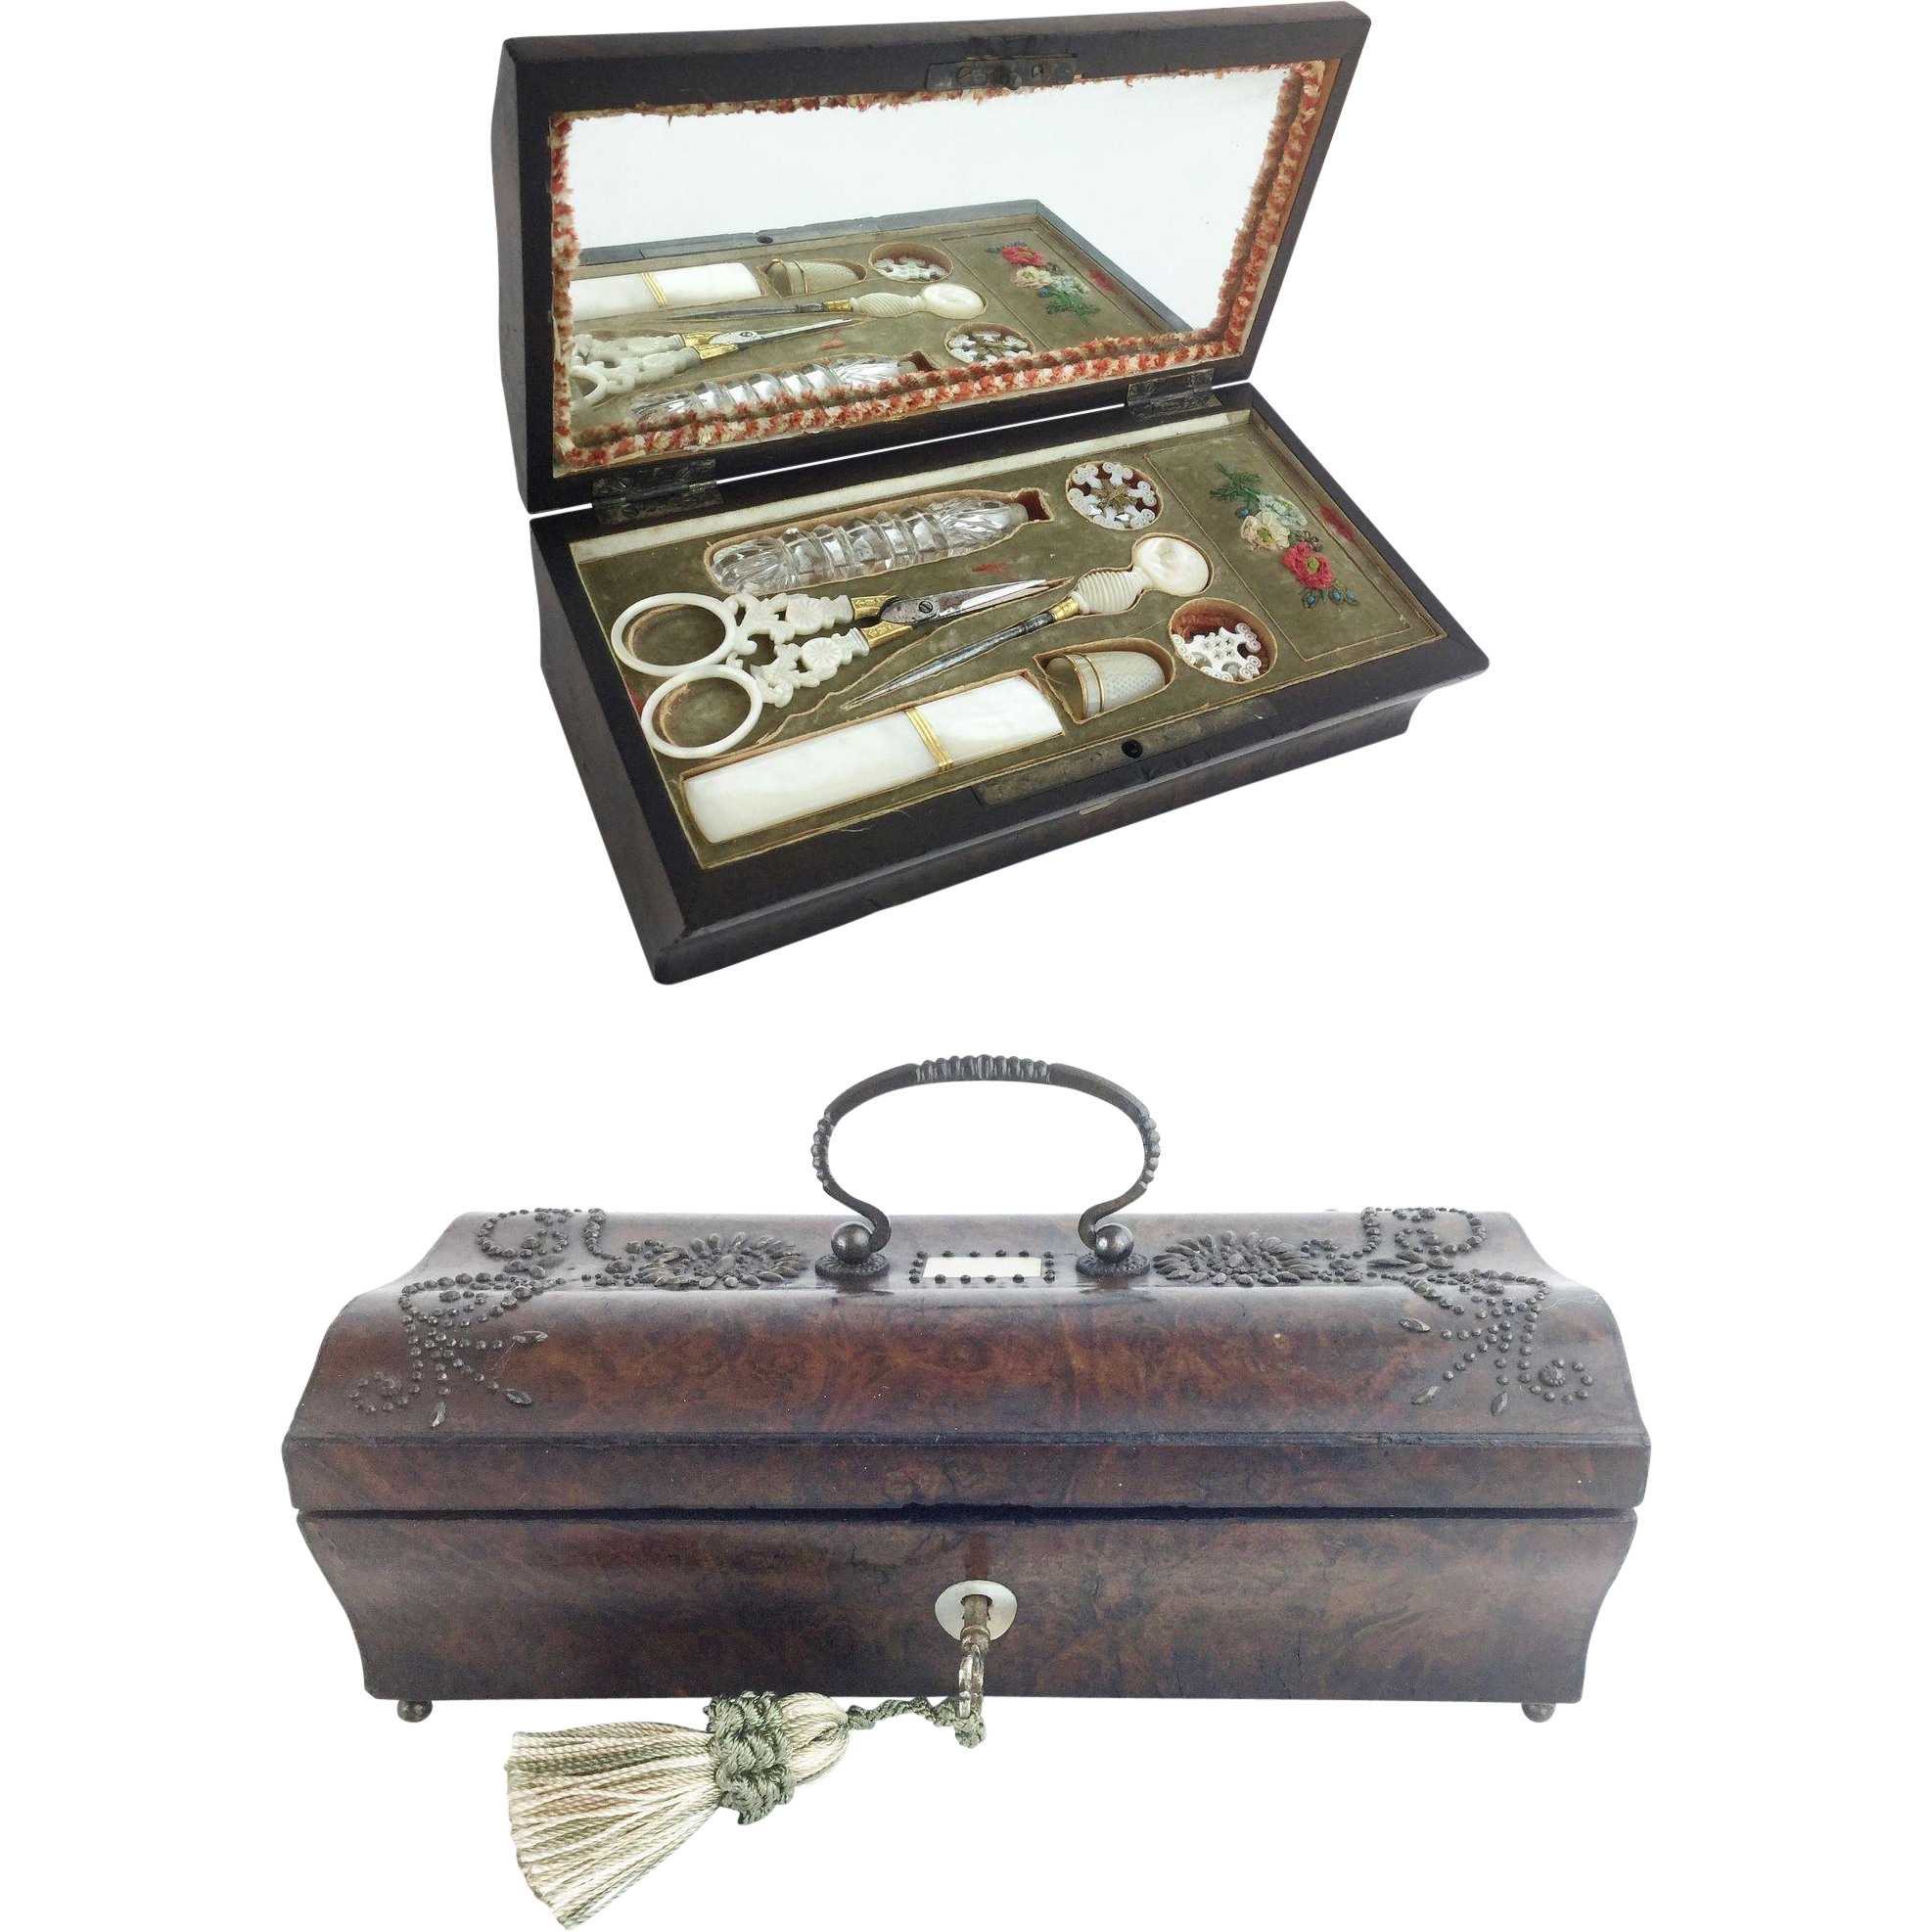 Antique Palais Royal Sewing Etui Box